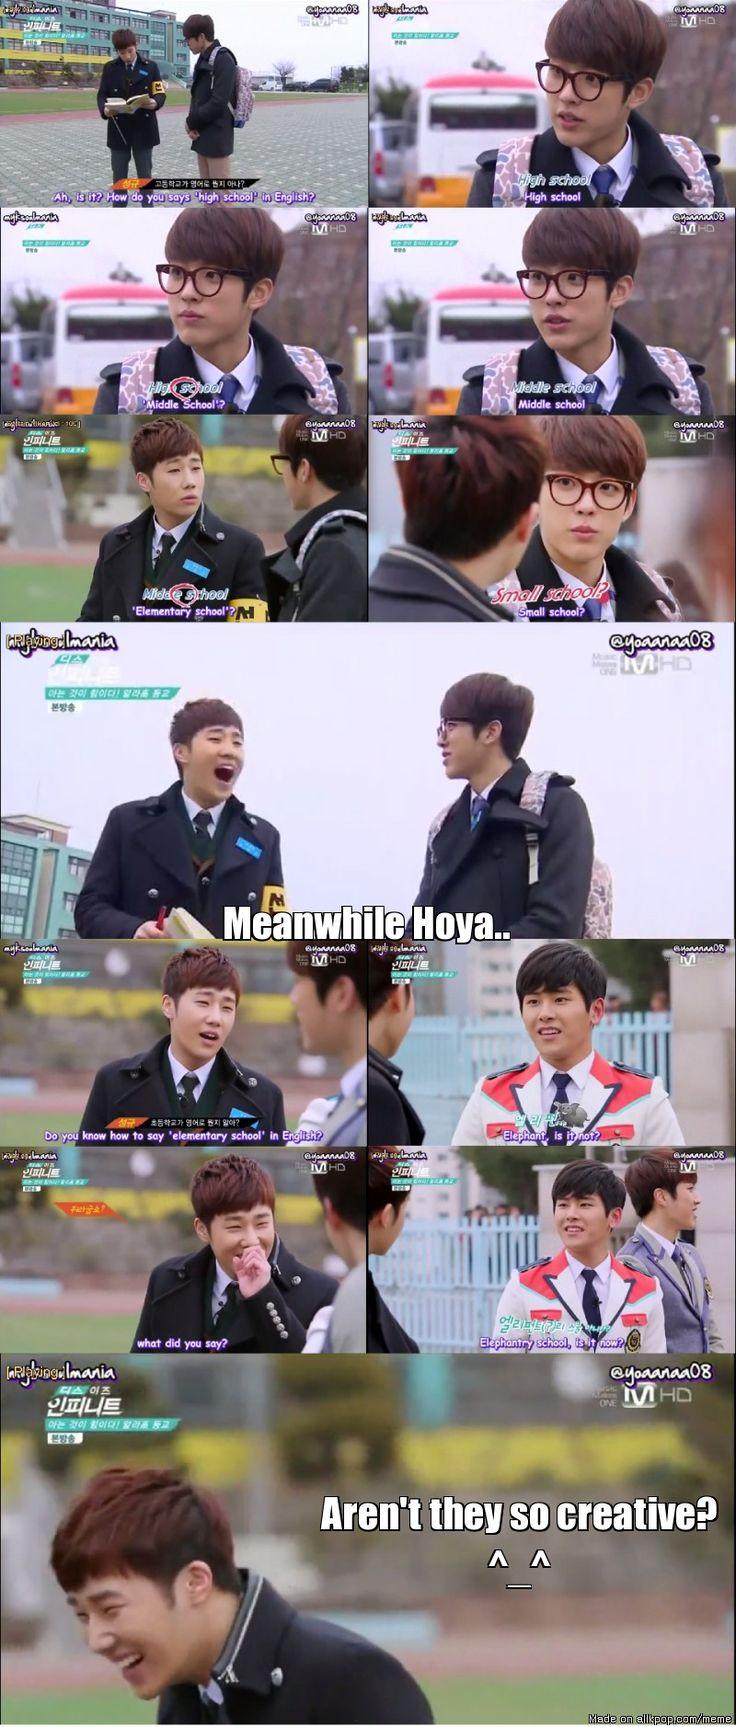 English Battle: Sungyeol vs. Hoya | allkpop Meme Center